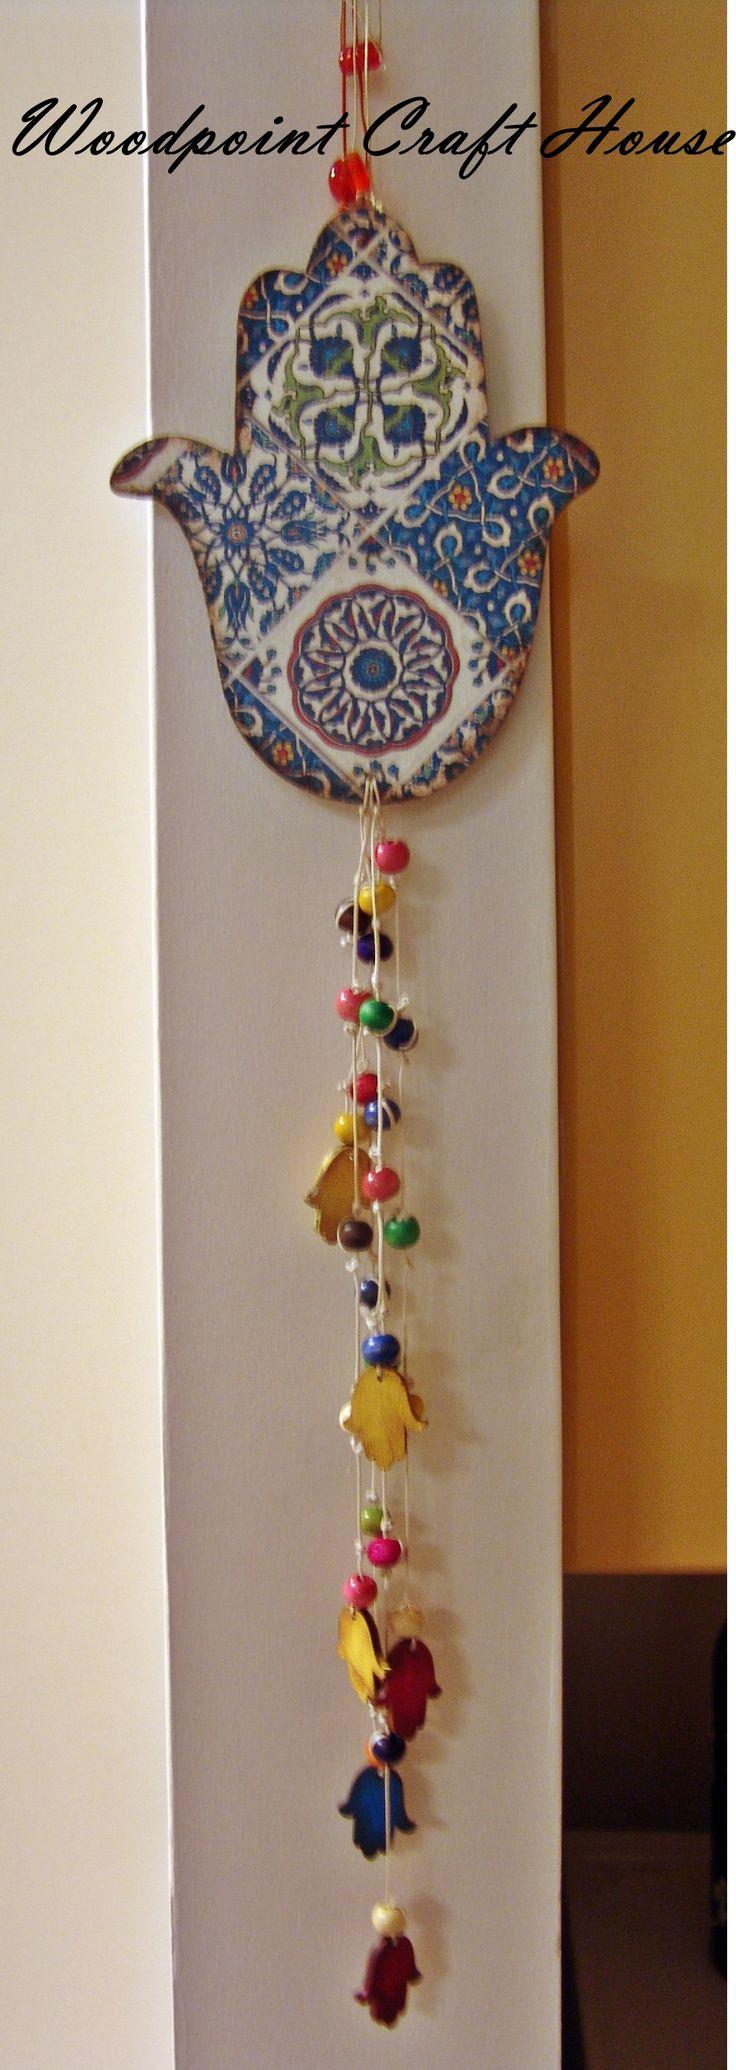 Hamsa wall decor